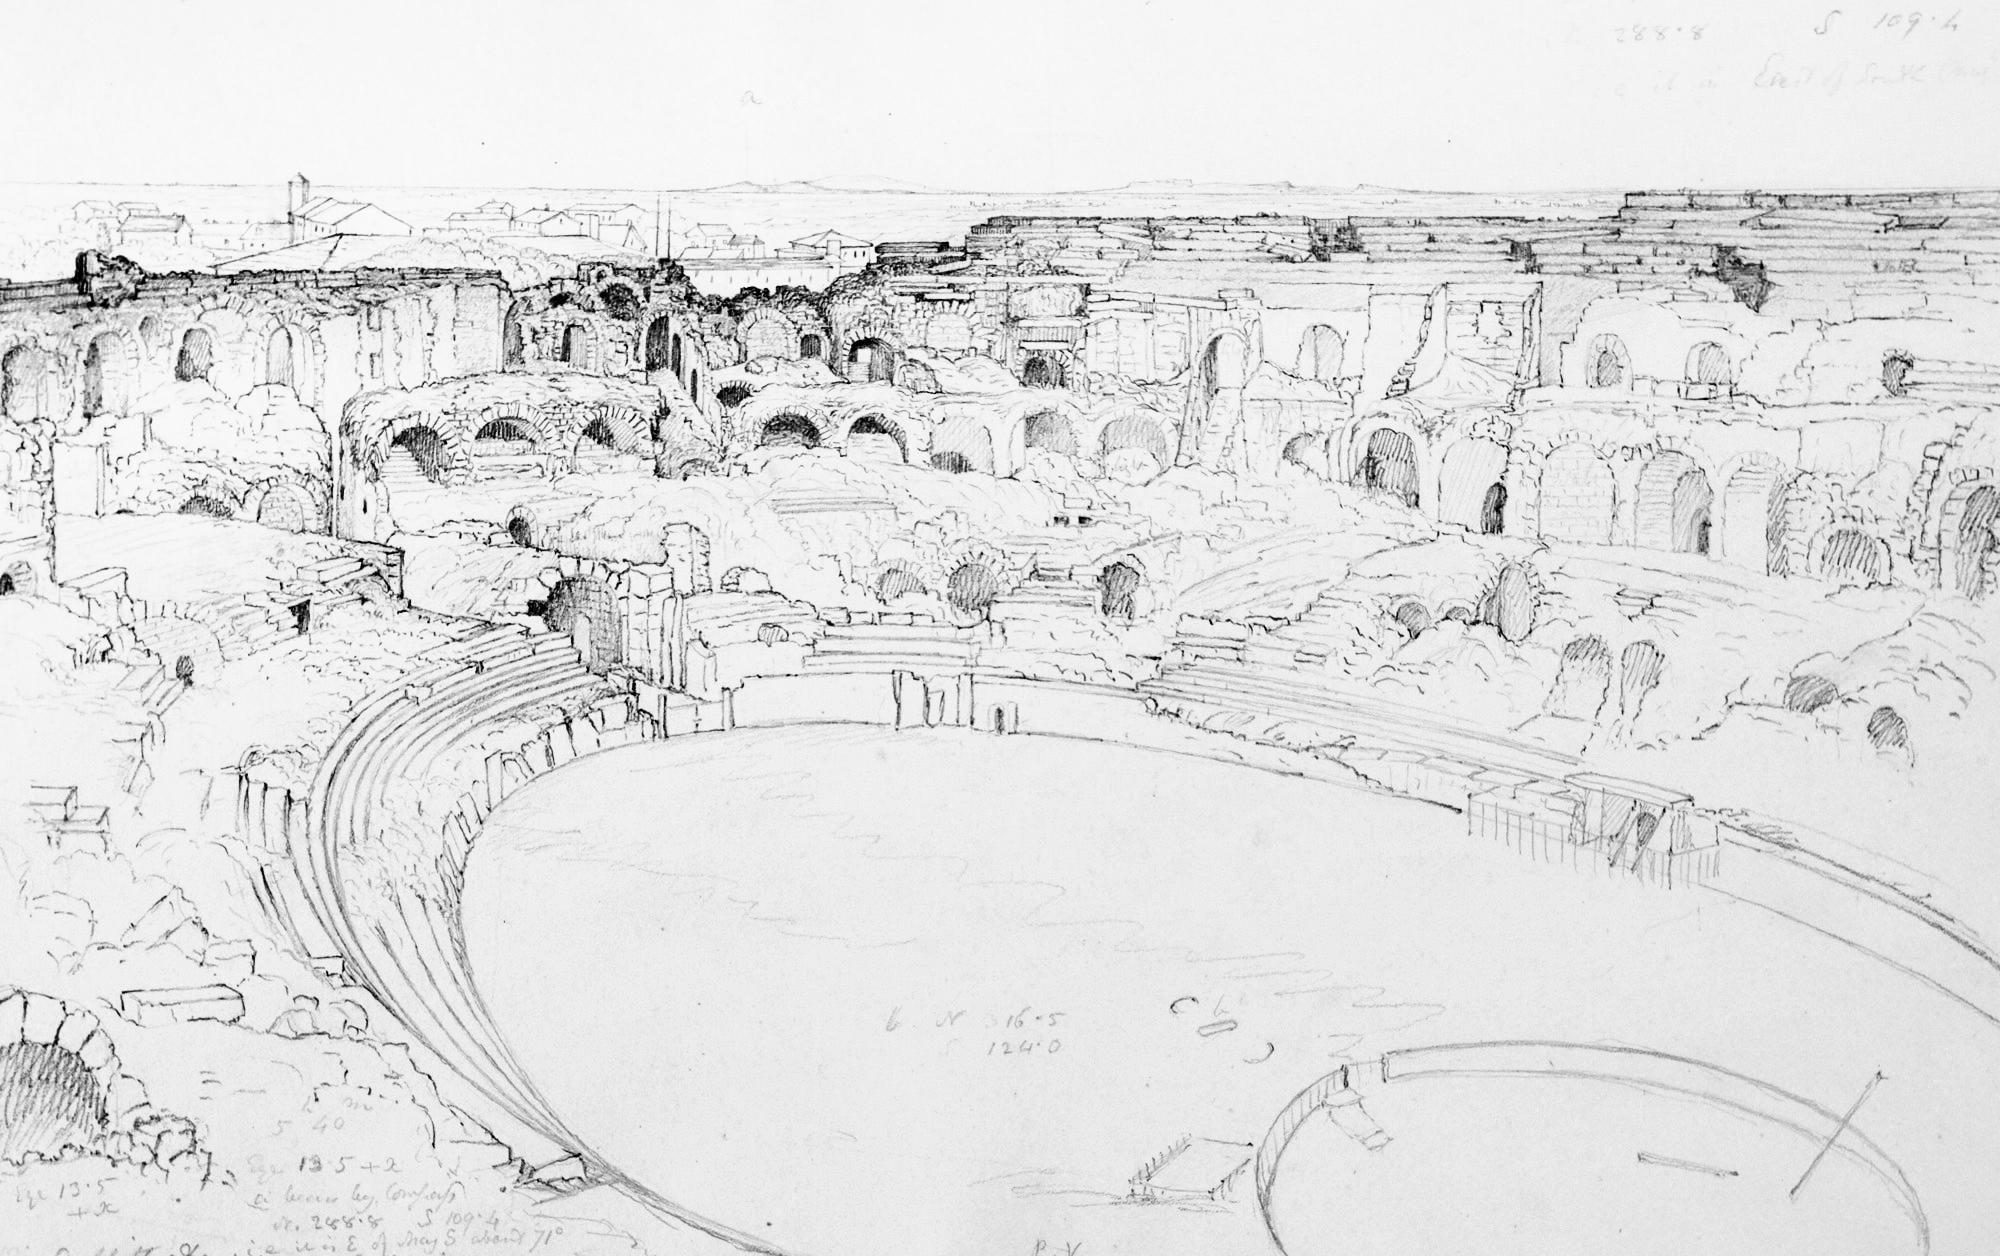 Sir John Herschel, Interior of the Amphitheater Nimes, Sept. 21, 1850